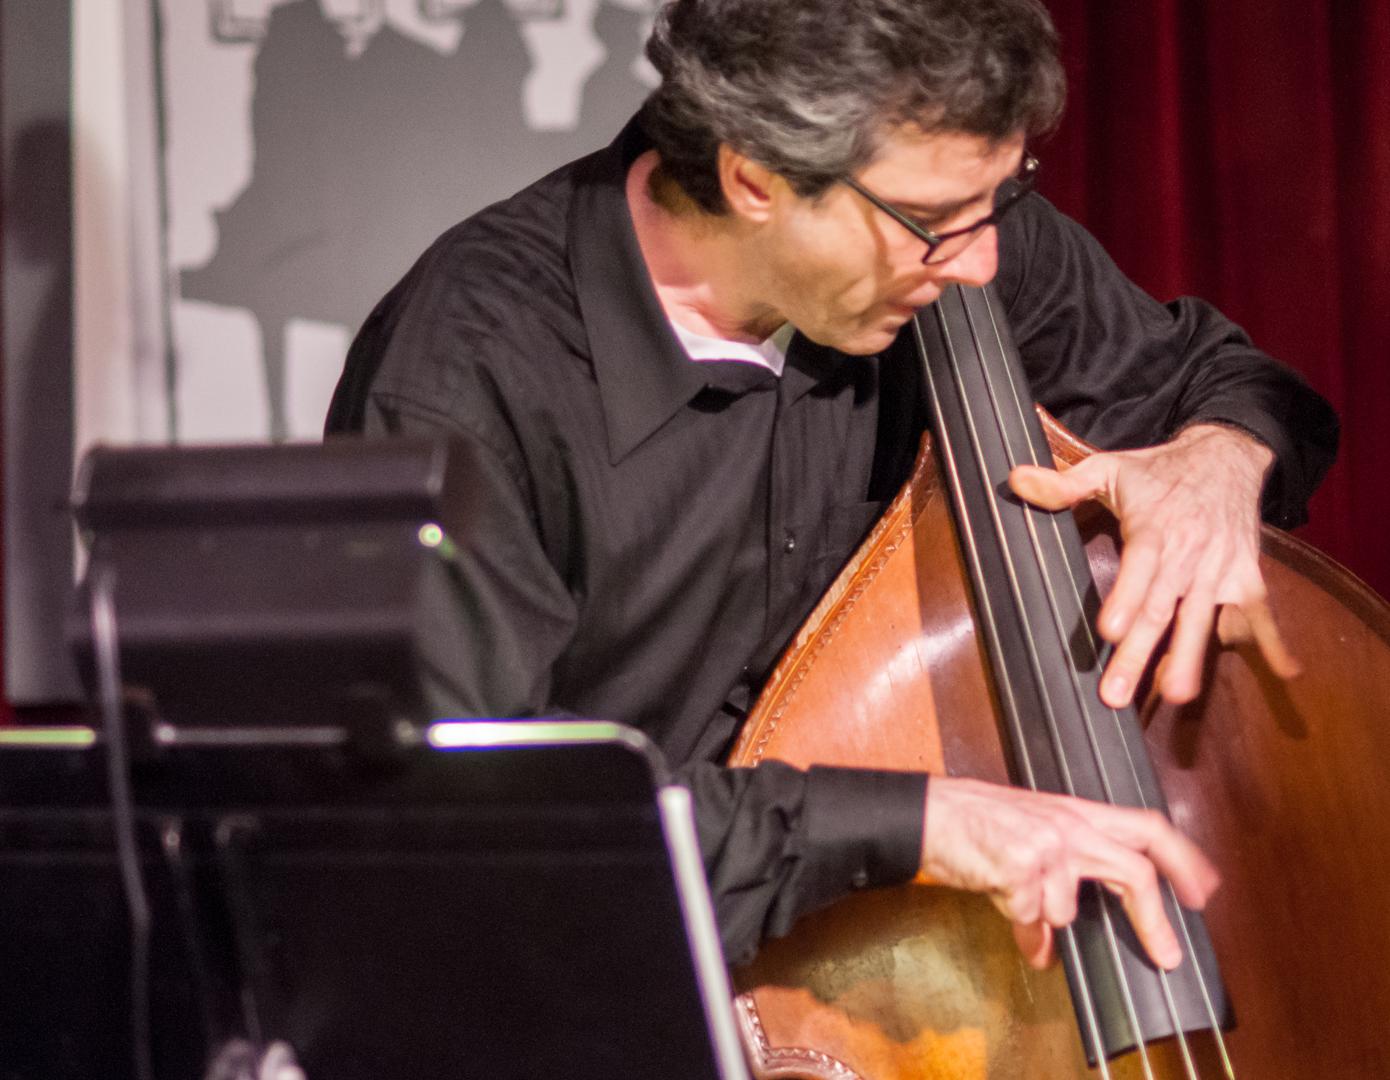 Joseph Lepore with the Melissa Aldana Quartet at the Jazz Gallery